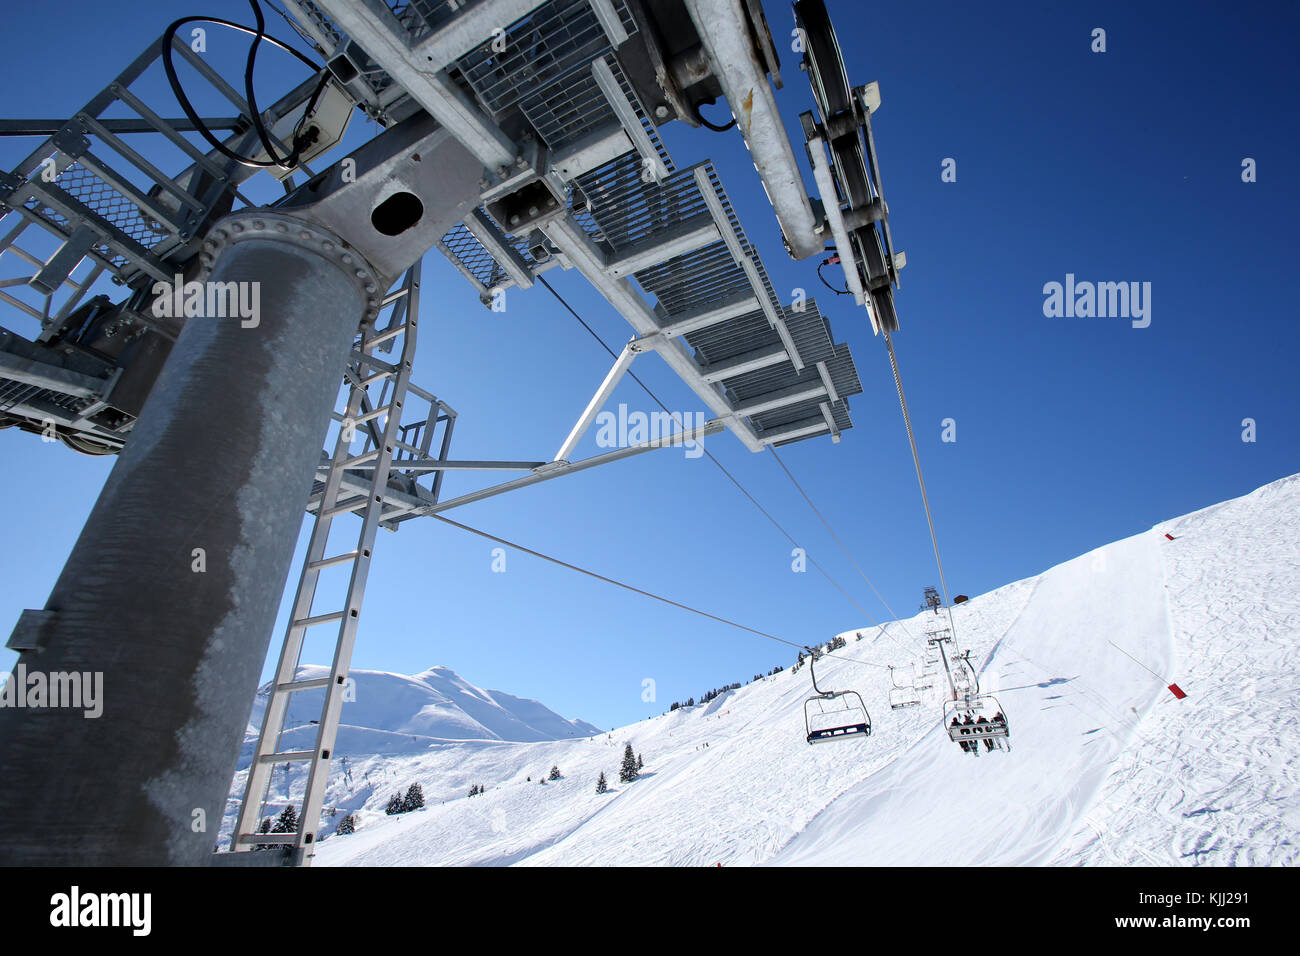 Alpes françaises. Télésiège. La France. Photo Stock